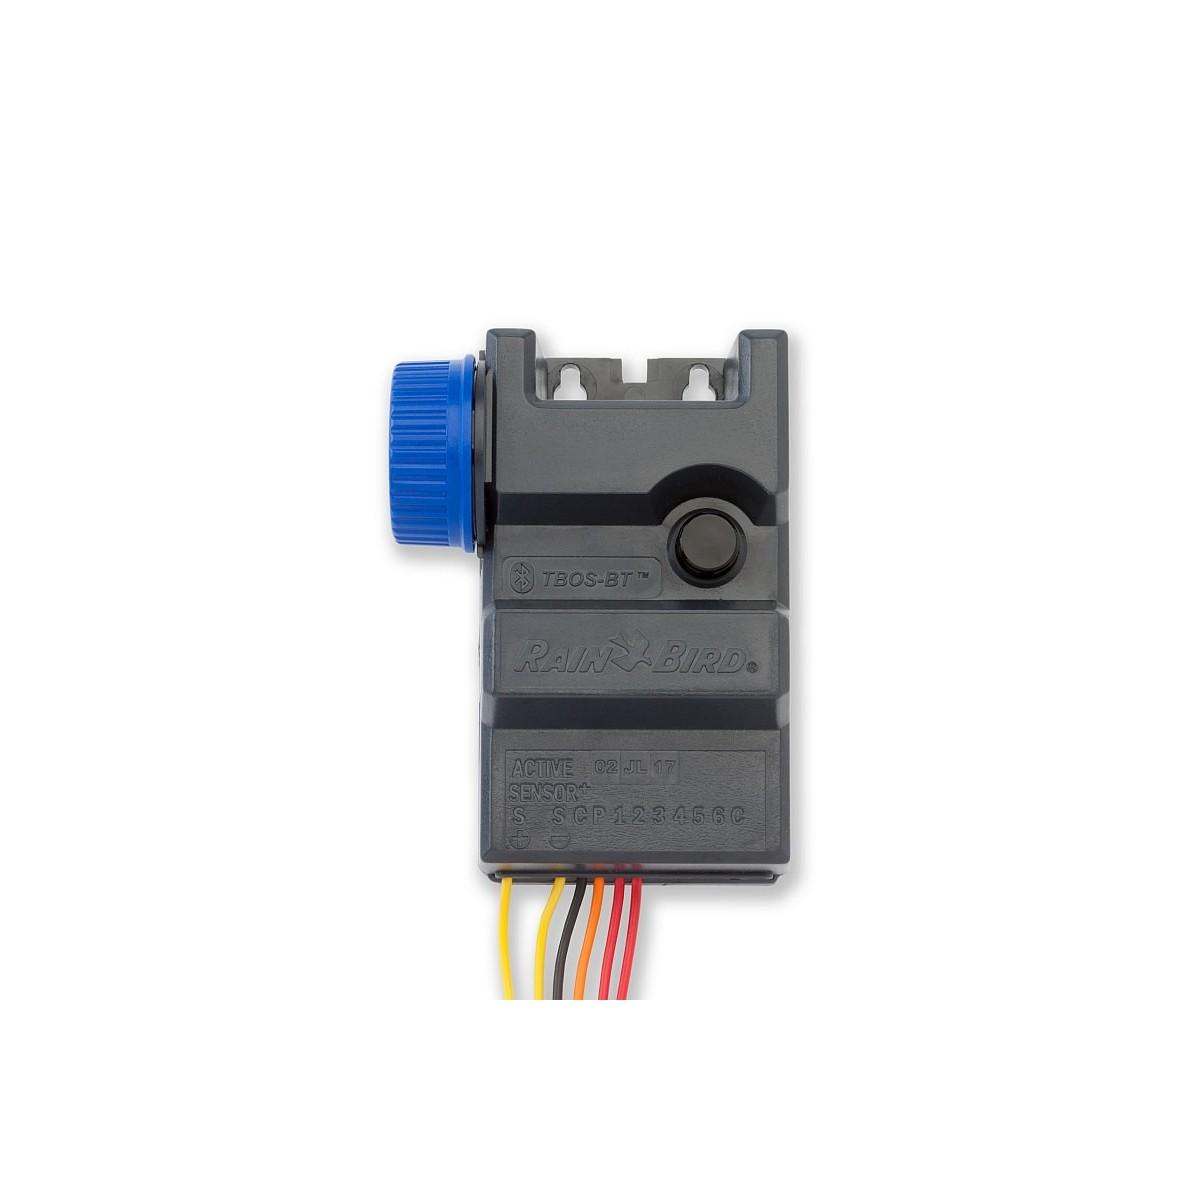 difusor uni-spray 10 cm + 15hevan